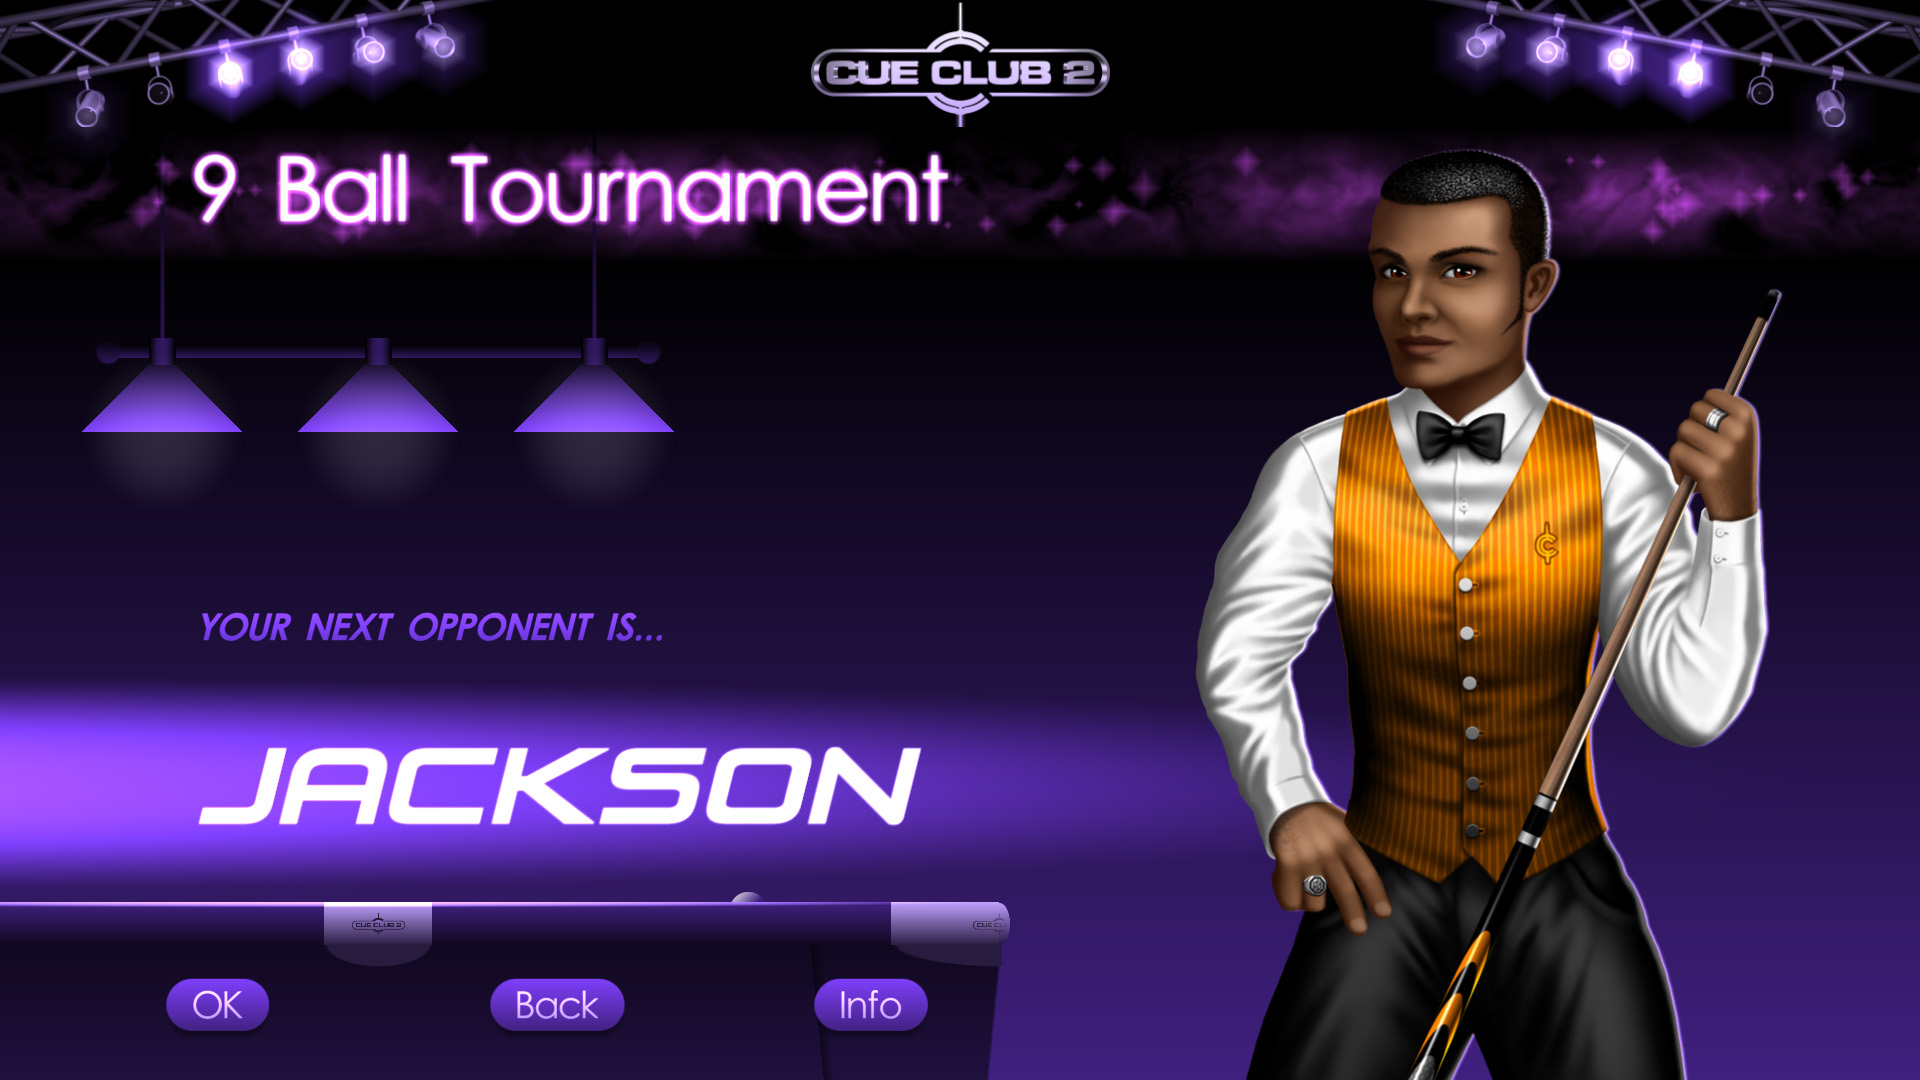 Cue club 2 pc torrent download